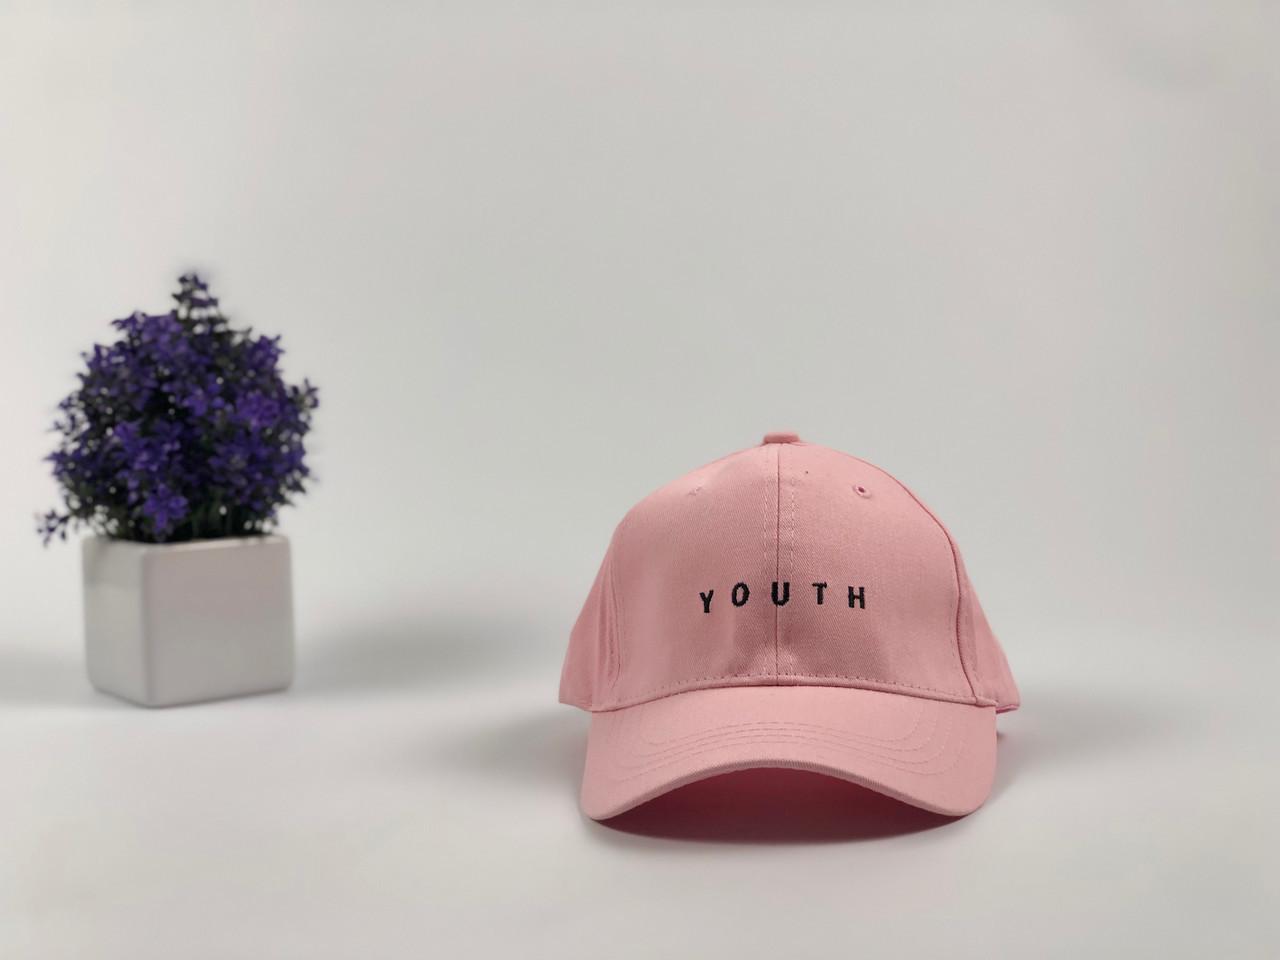 Кепка бейсболка Youth (розовая) застежка метал